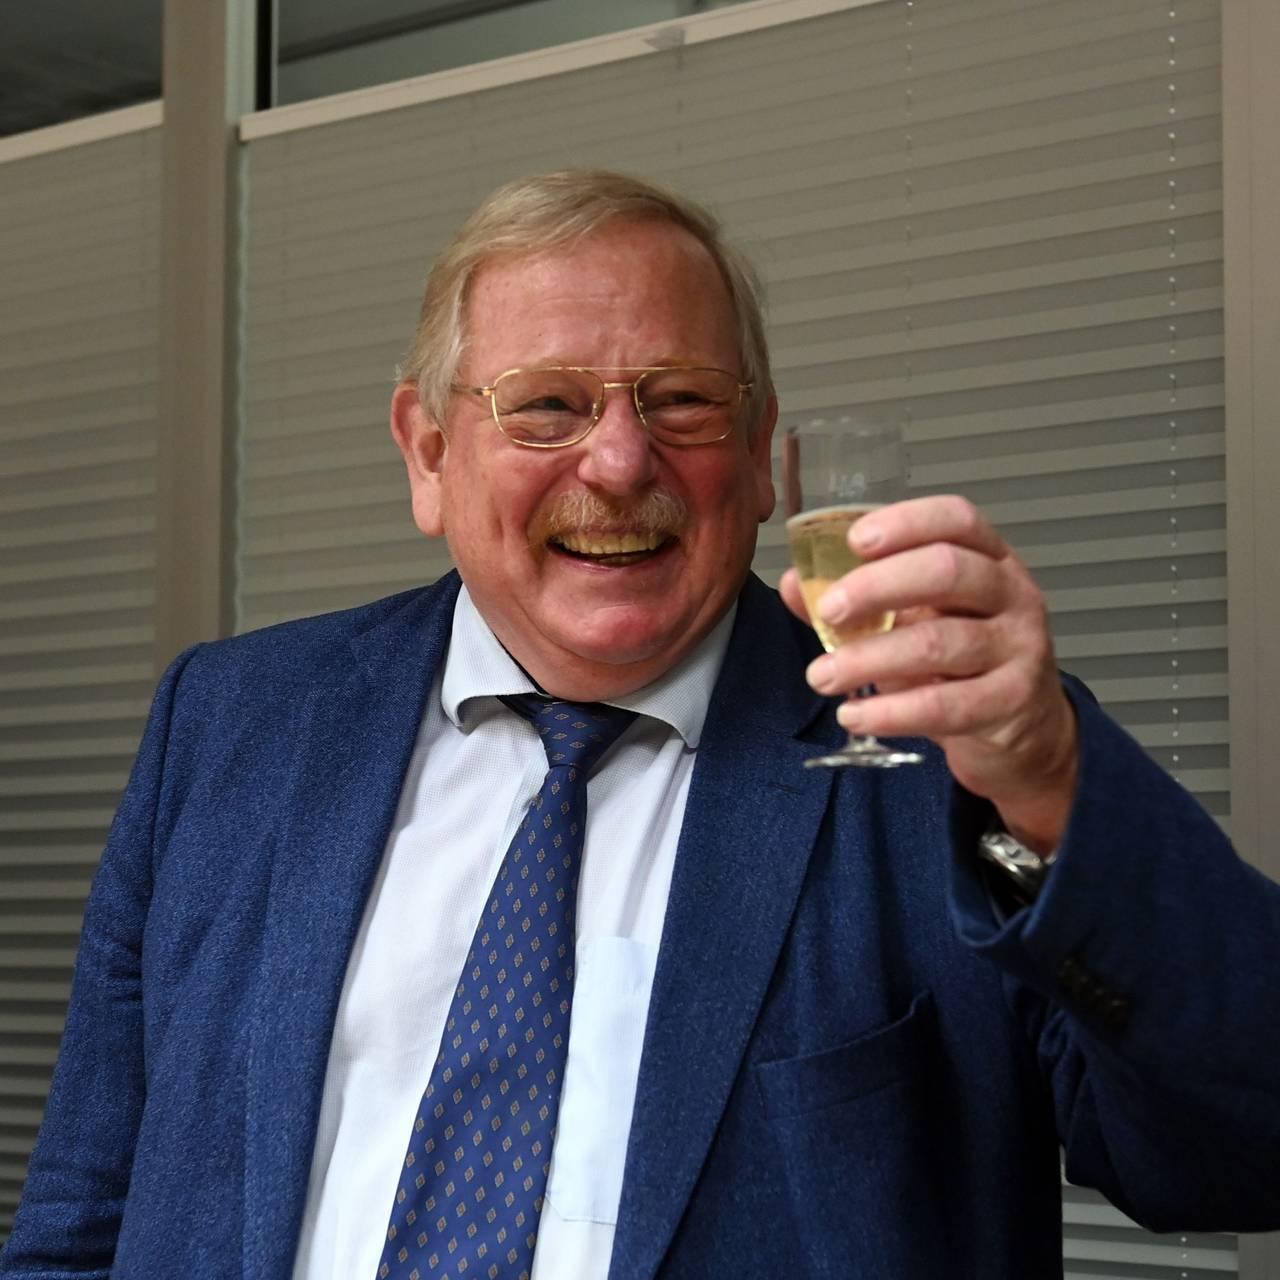 Reinhard Genzel feirer nobelprisen med et glass musserende.